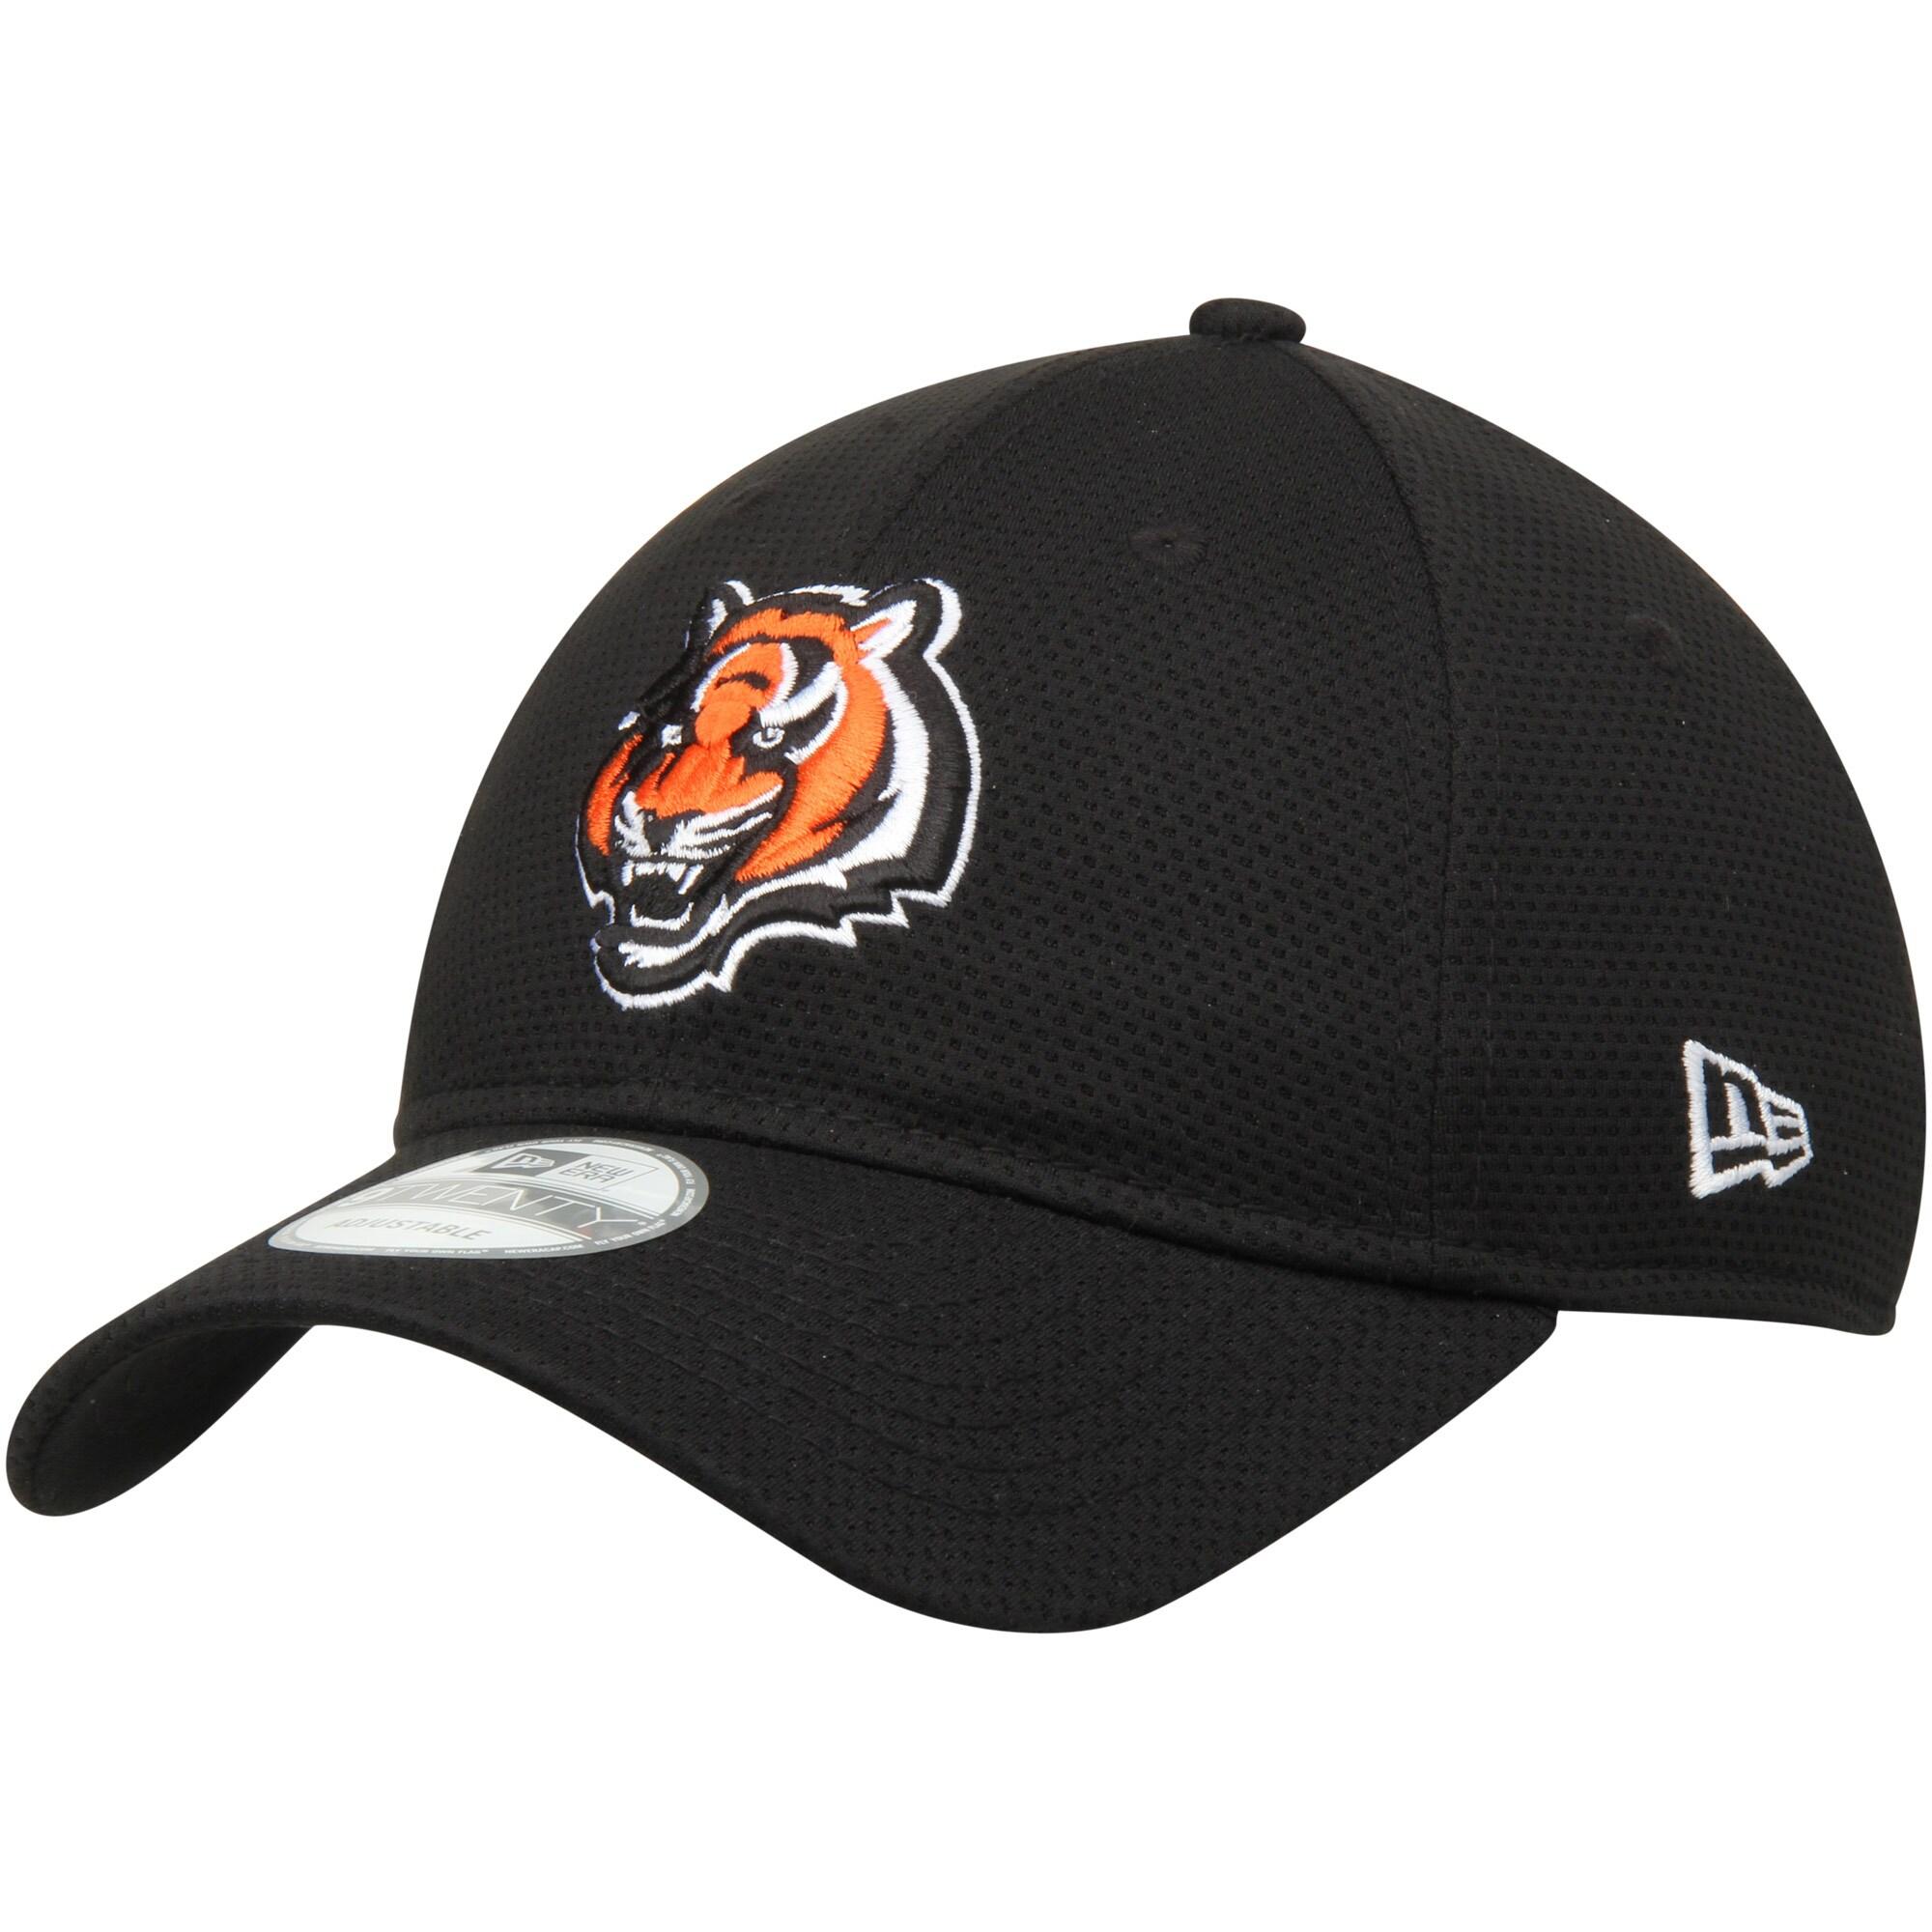 Cincinnati Bengals New Era Perf Shore Training Mesh 9TWENTY Adjustable Hat - Black